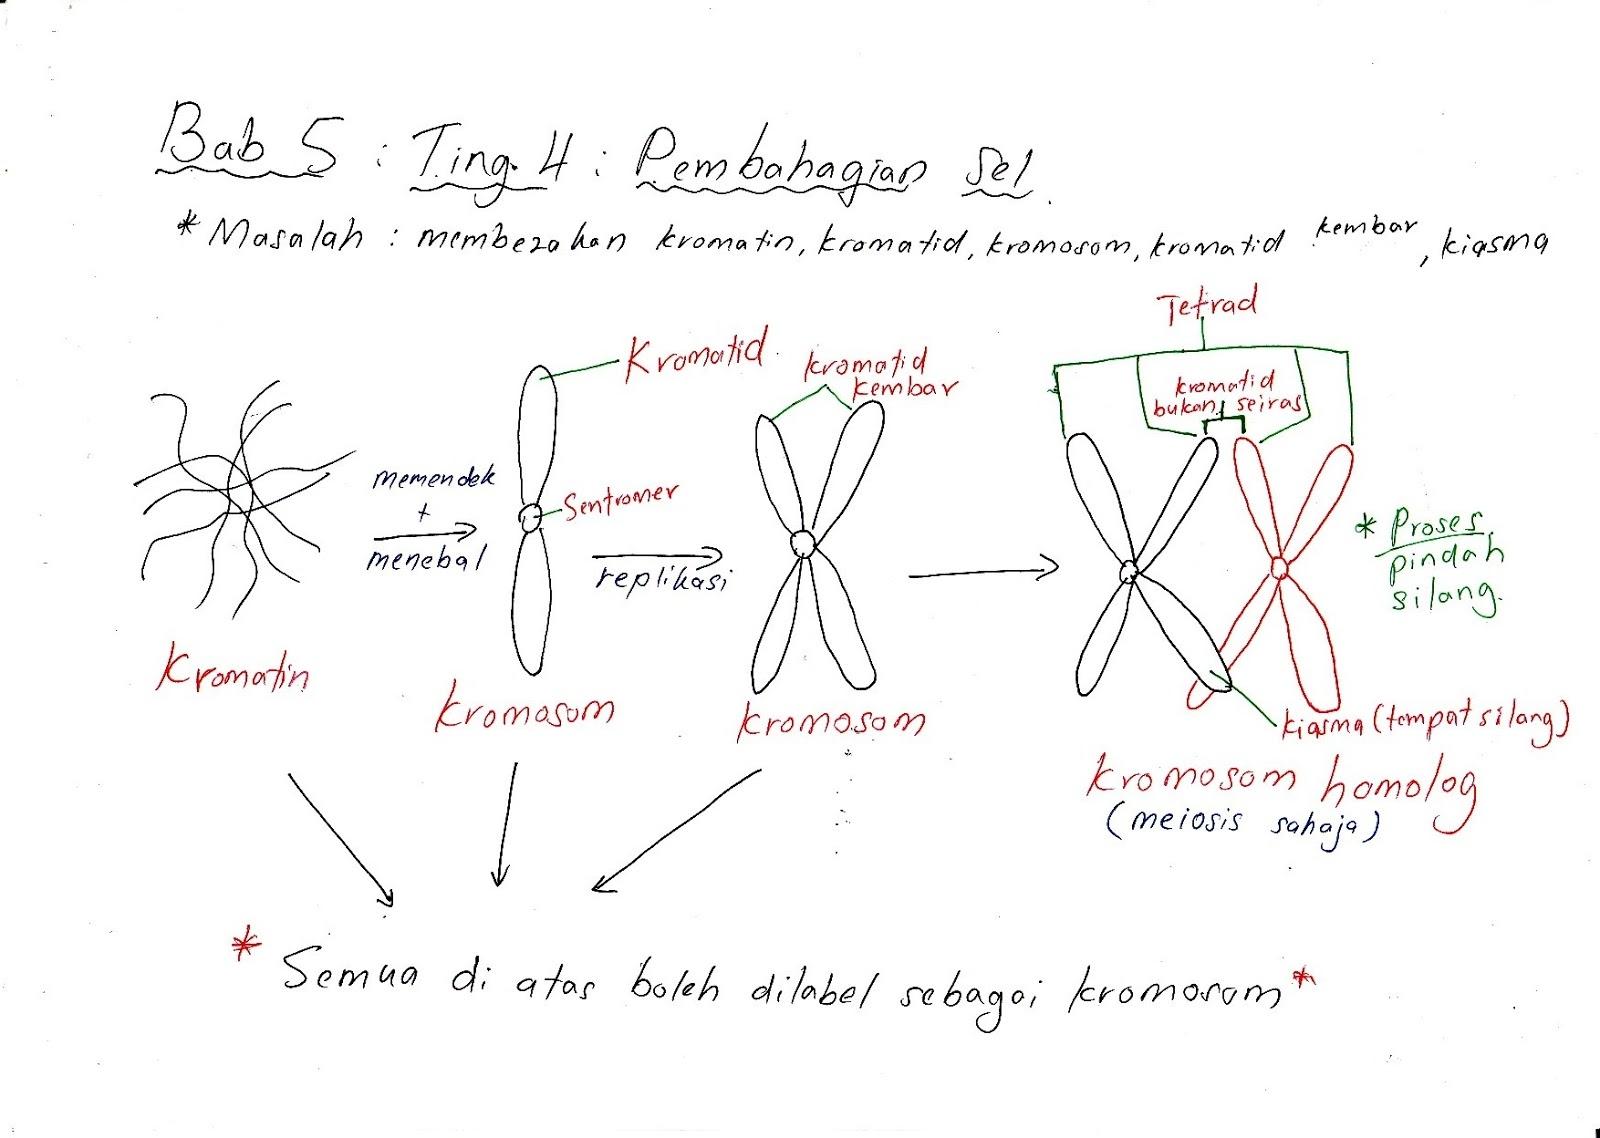 Nota Biologi Tingkatan 4 Yang Sangat Meletup Bijak Tekun Nota Kreatif Biologi Tingkatan 4 Bab 5 Of Himpunan Nota Biologi Tingkatan 4 Yang Terhebat Untuk Ibubapa Perolehi